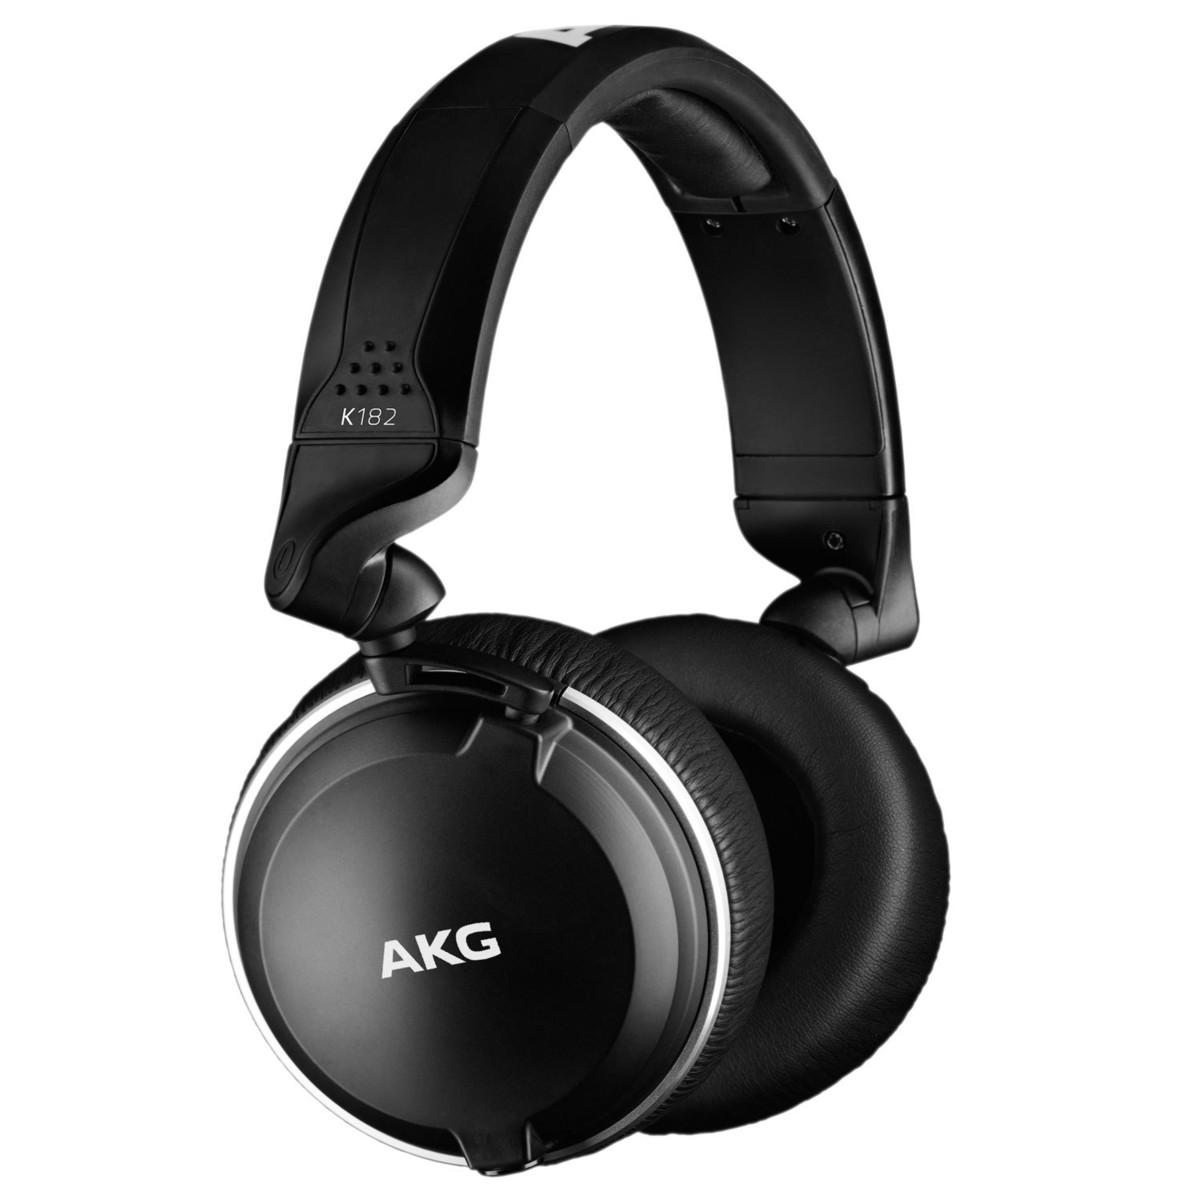 AKG K182 Closed-Back Monitoring Headphones at Gear4music